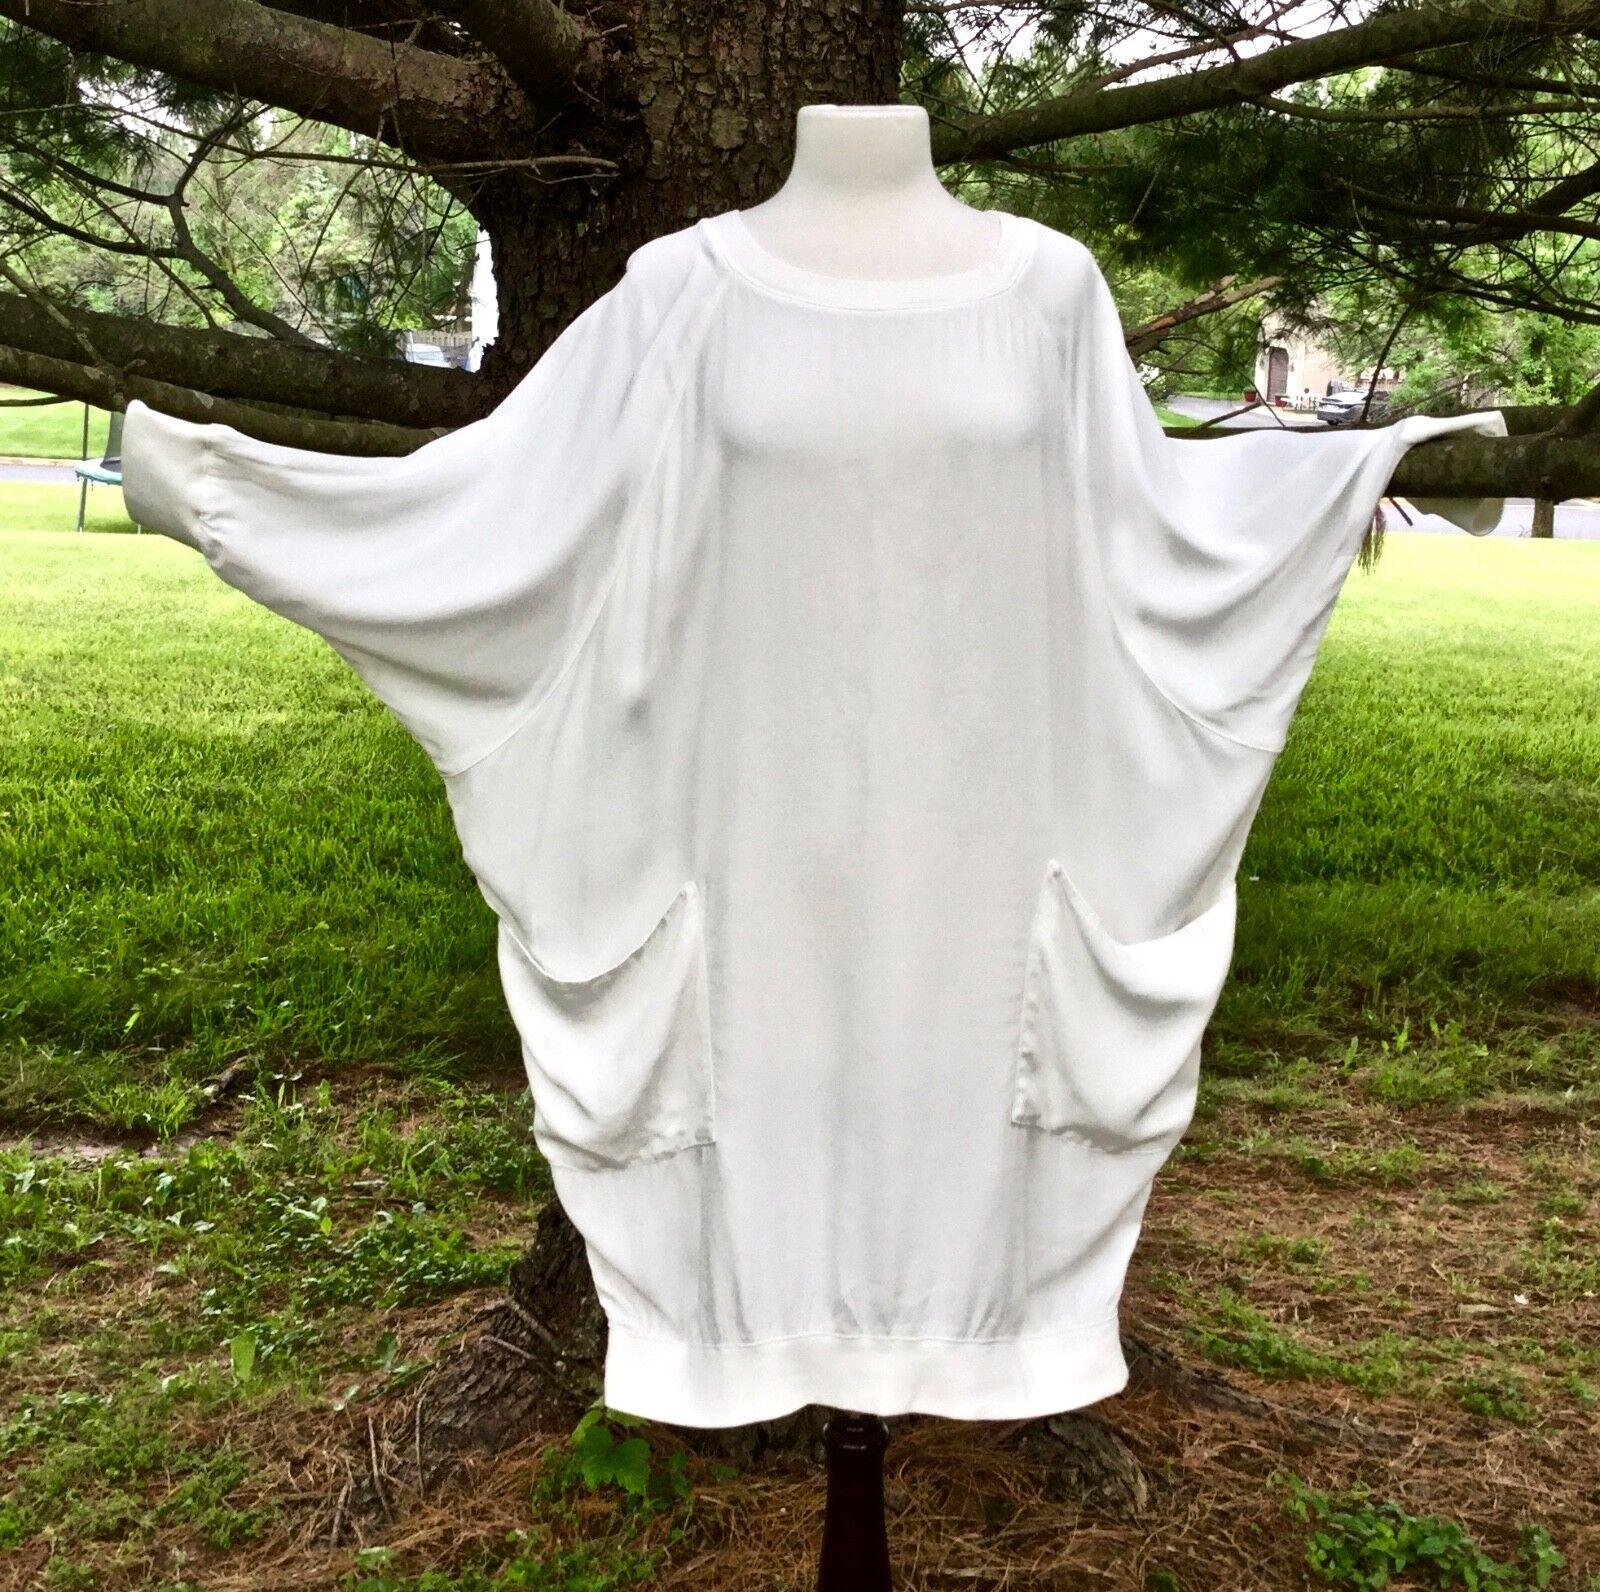 Free People Tunic Dress OverGrößed Weiß Drapy Dolman Sleeve Knit Trim L New